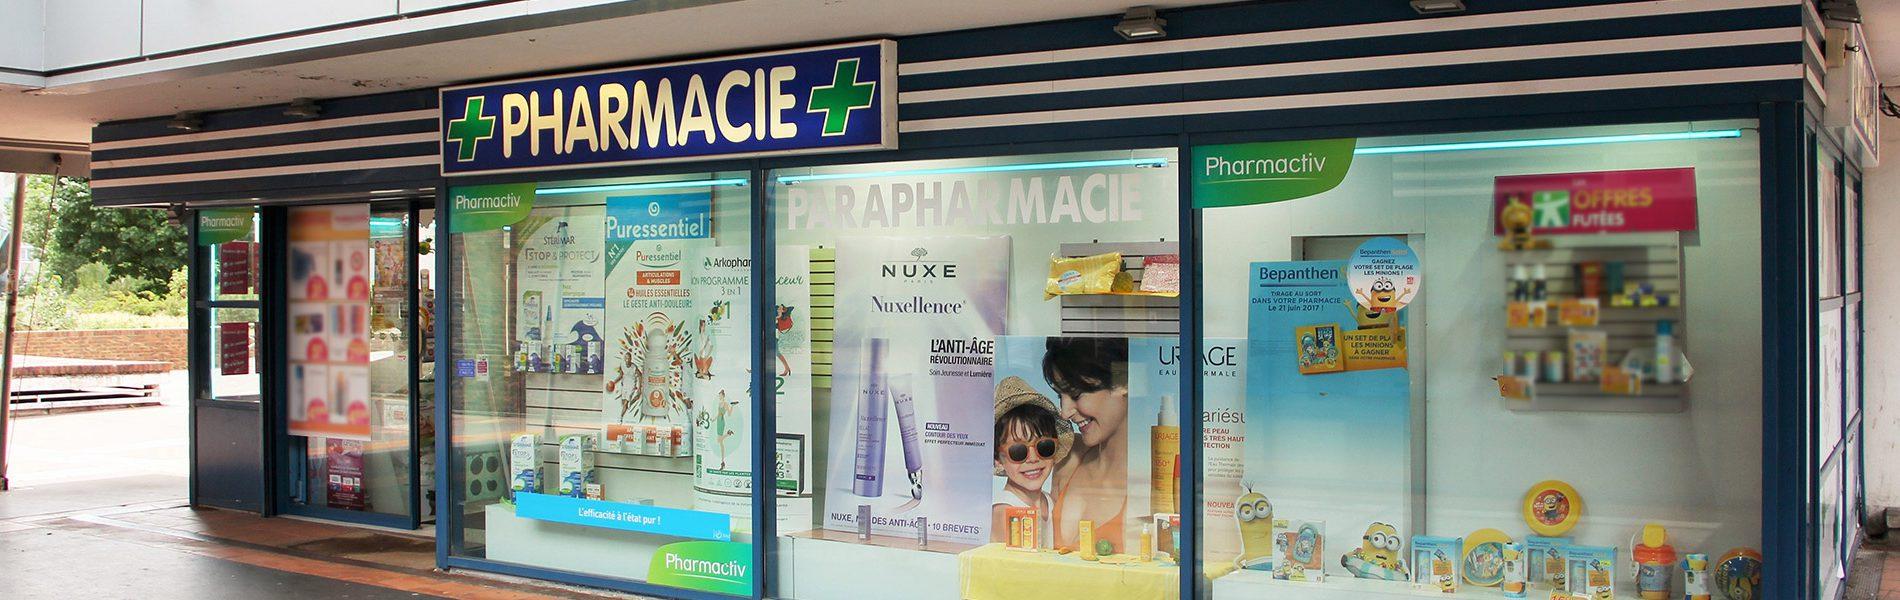 Pharmacie DES EPINETTES - Image Homepage 2